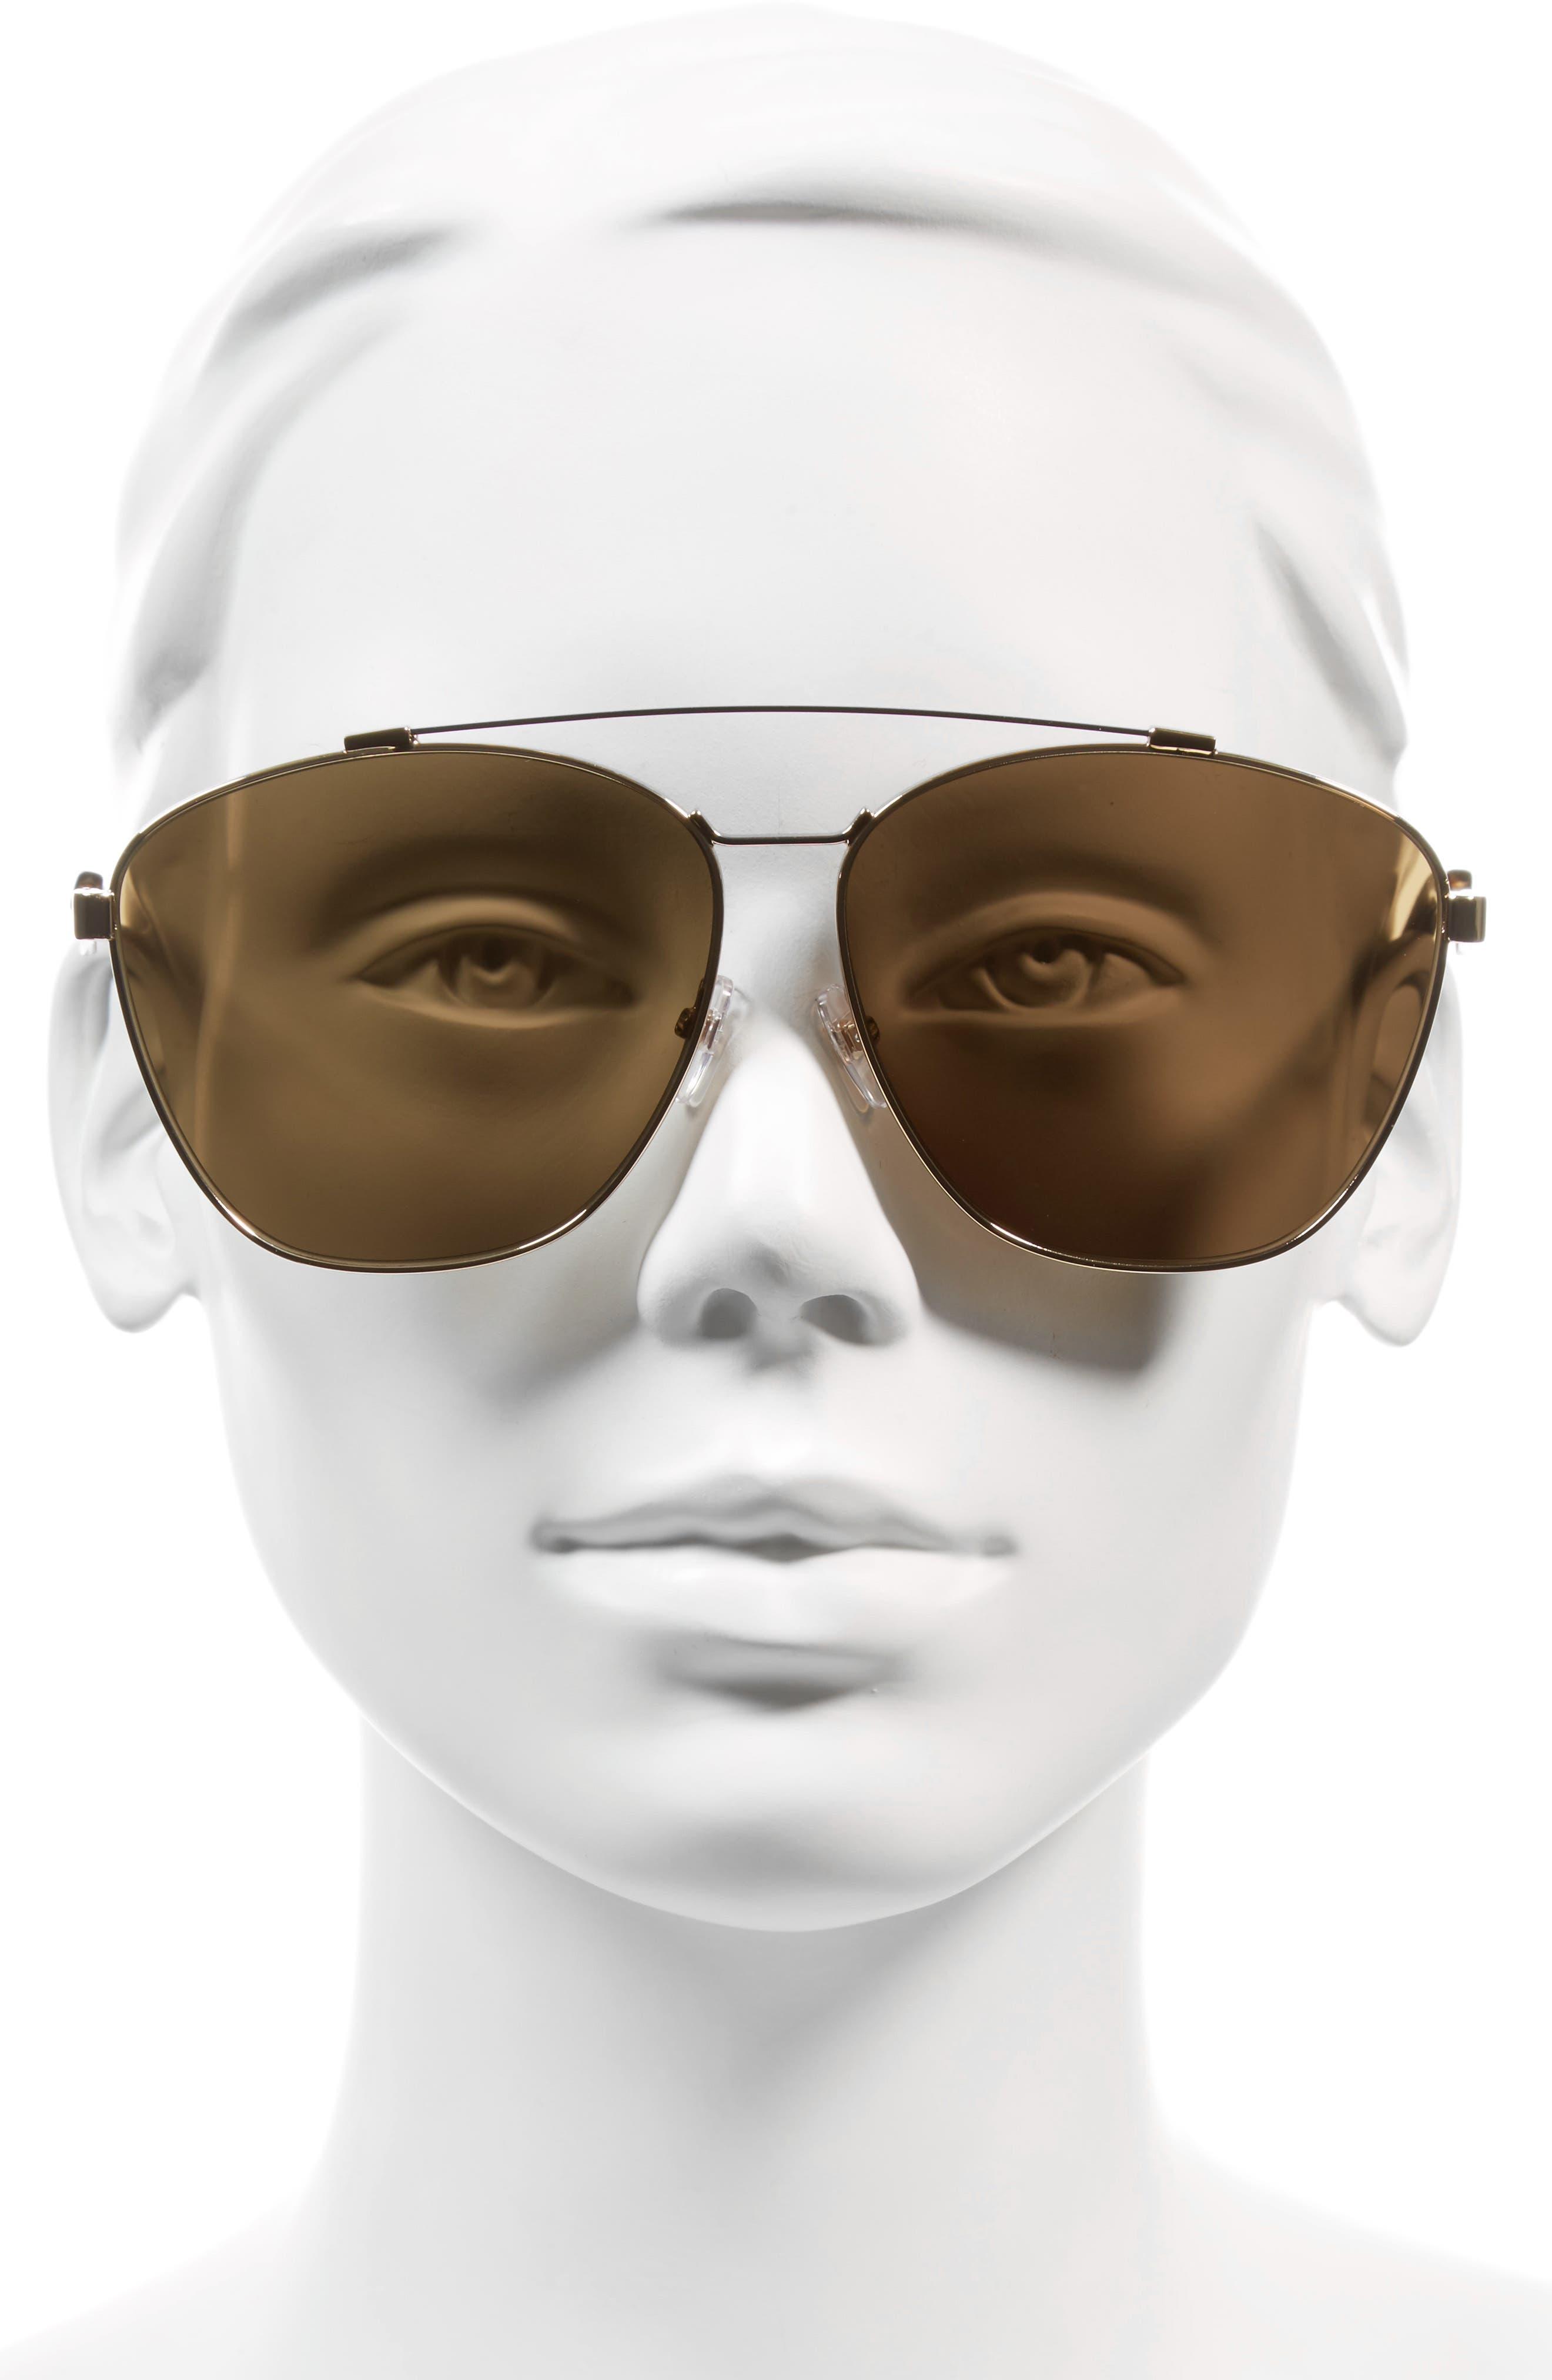 65mm Round Aviator Sunglasses,                             Alternate thumbnail 2, color,                             Gold